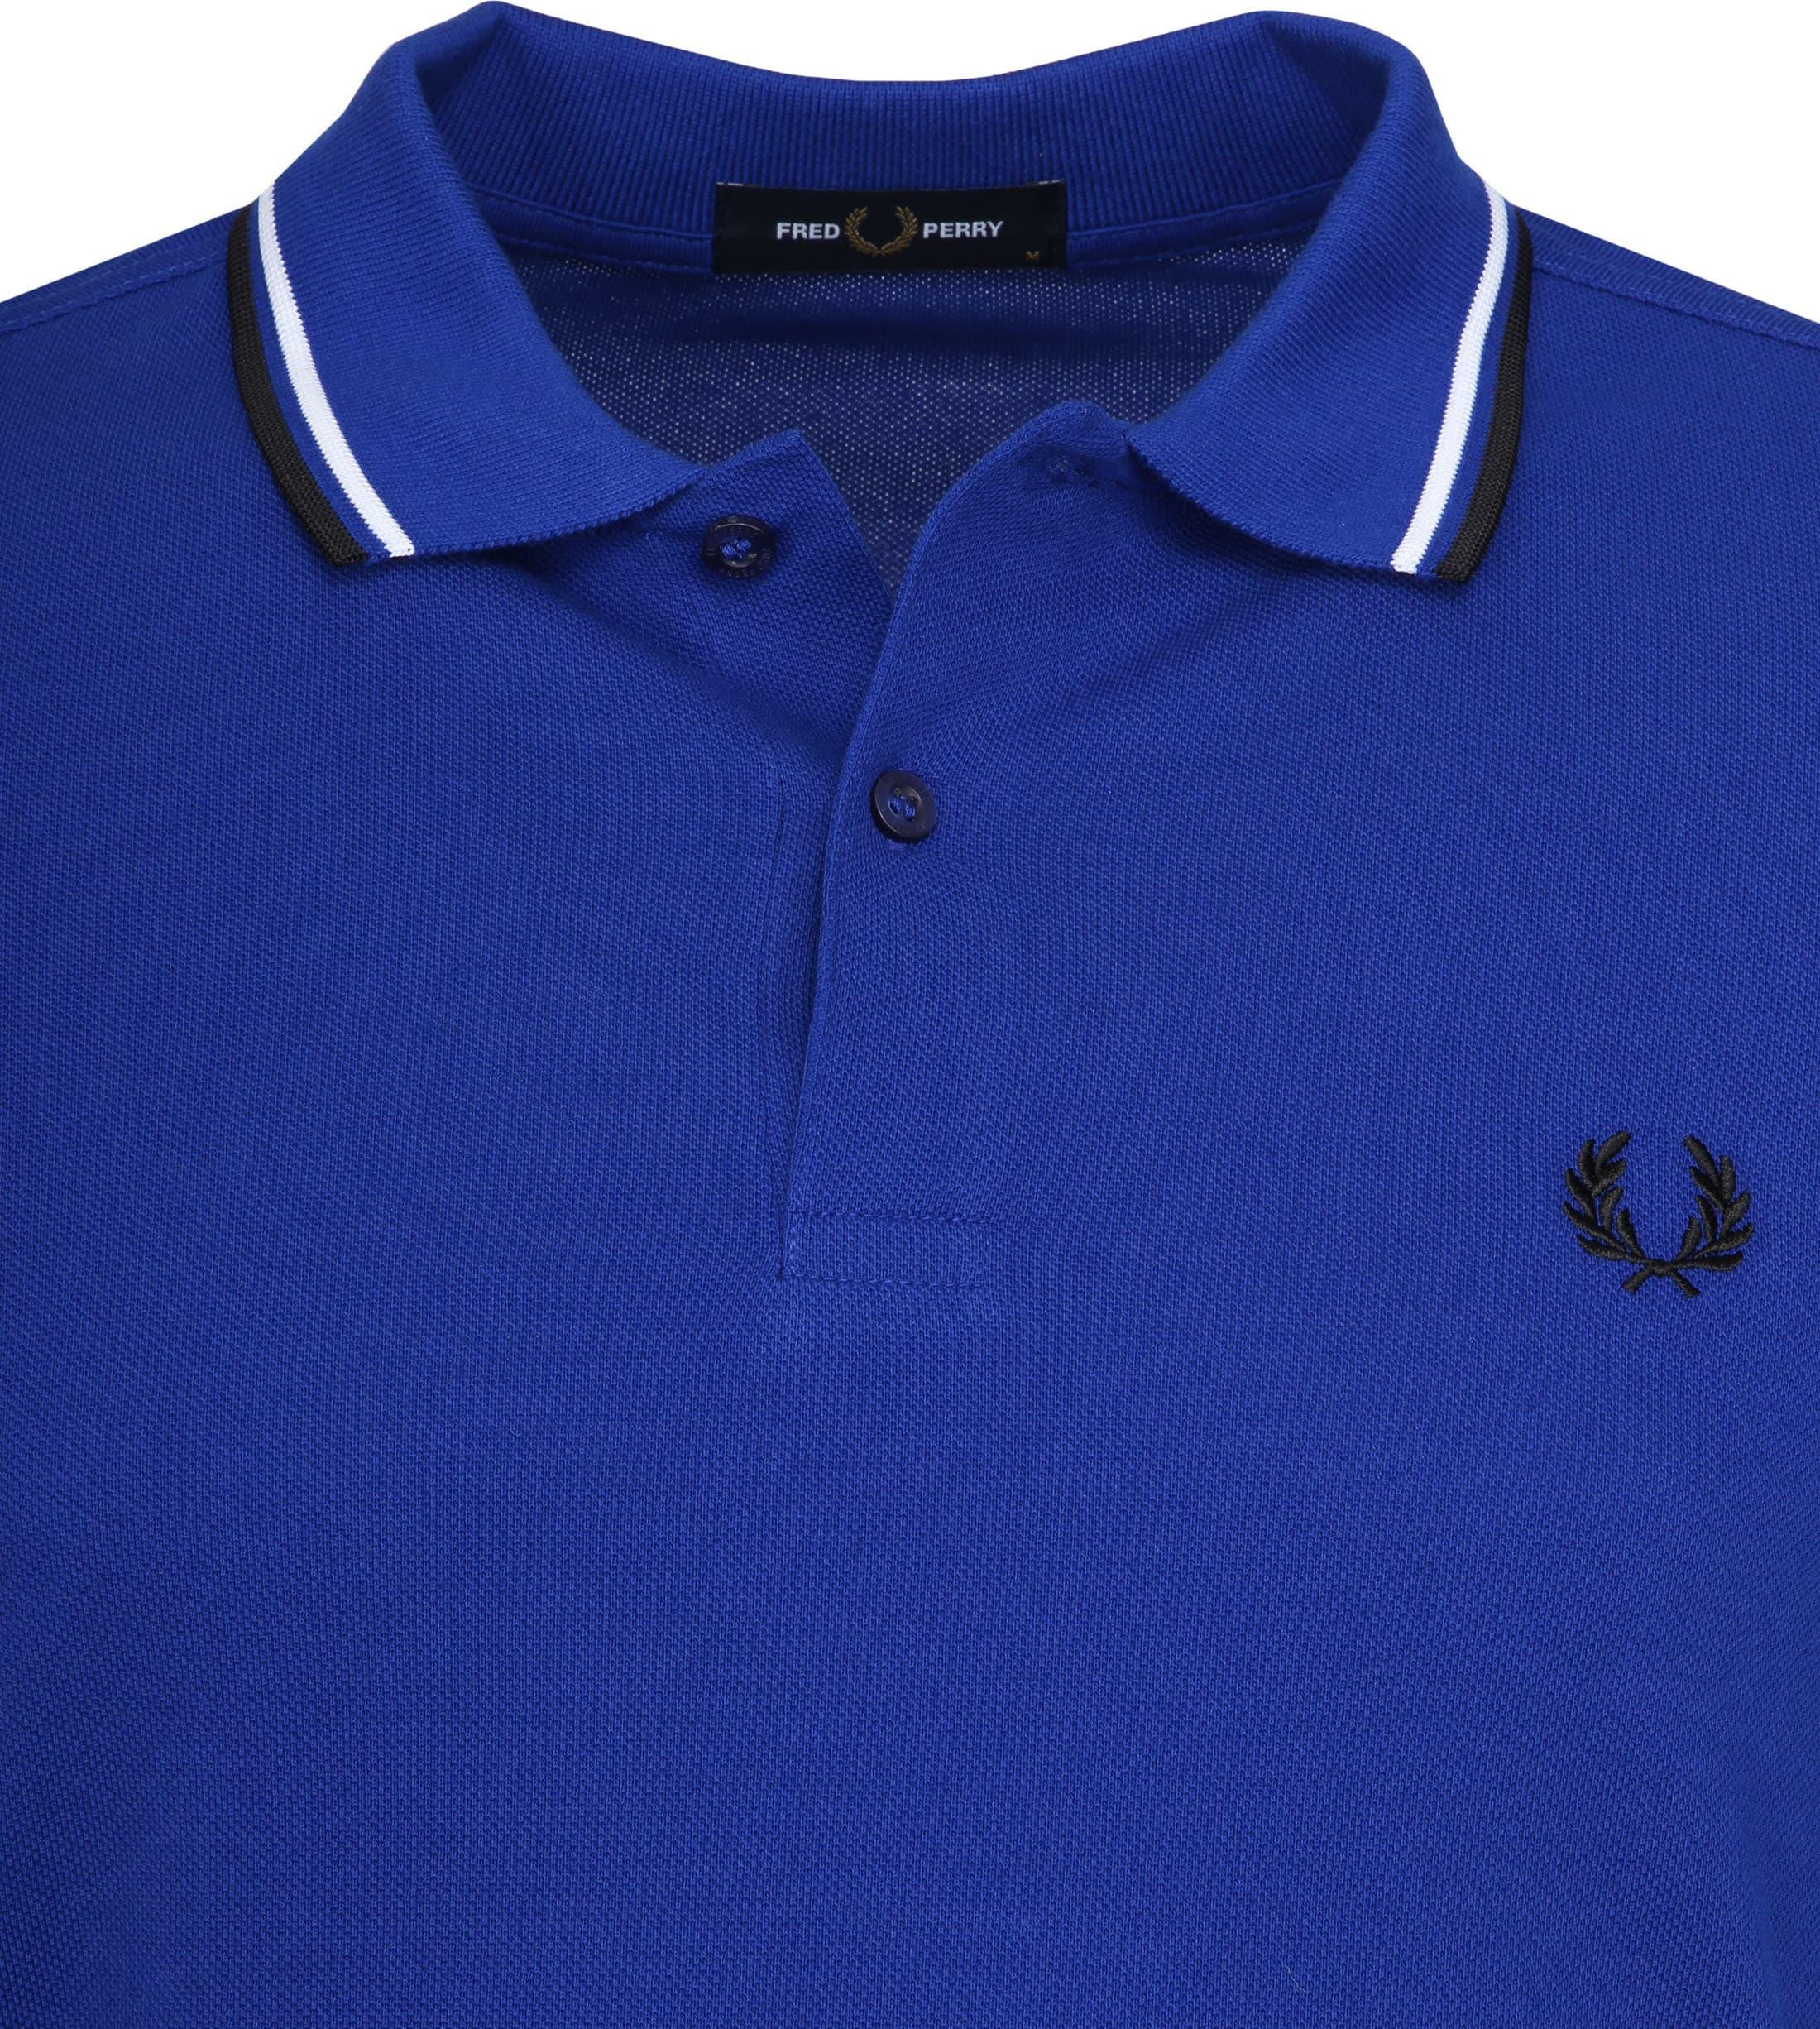 Fred Perry Poloshirt Blau I88 foto 1